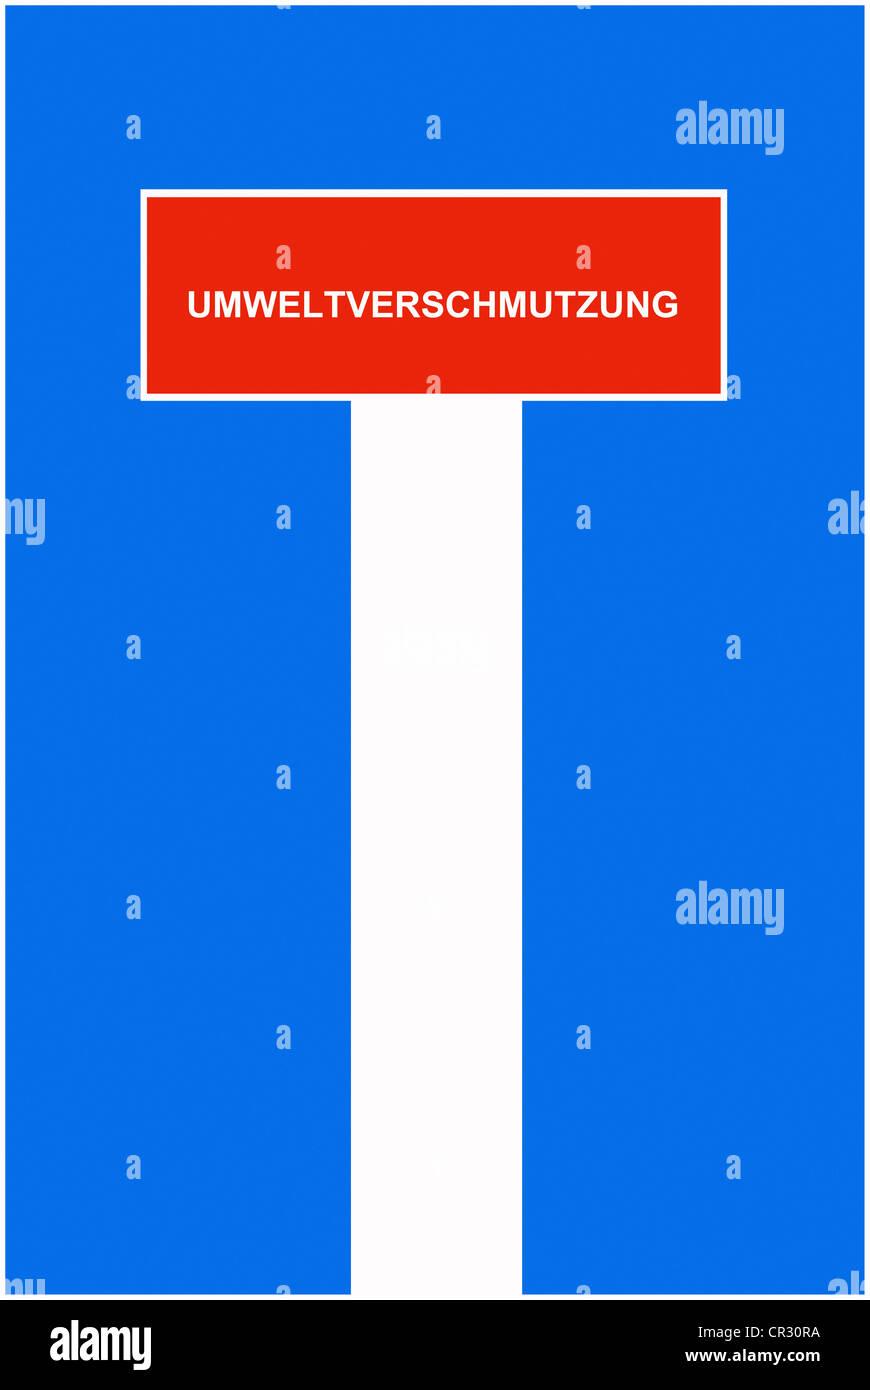 Symbolic image, dead end street, cul-de-sac, Umweltverschmutzung, German for 'environmental pollution' - Stock Image